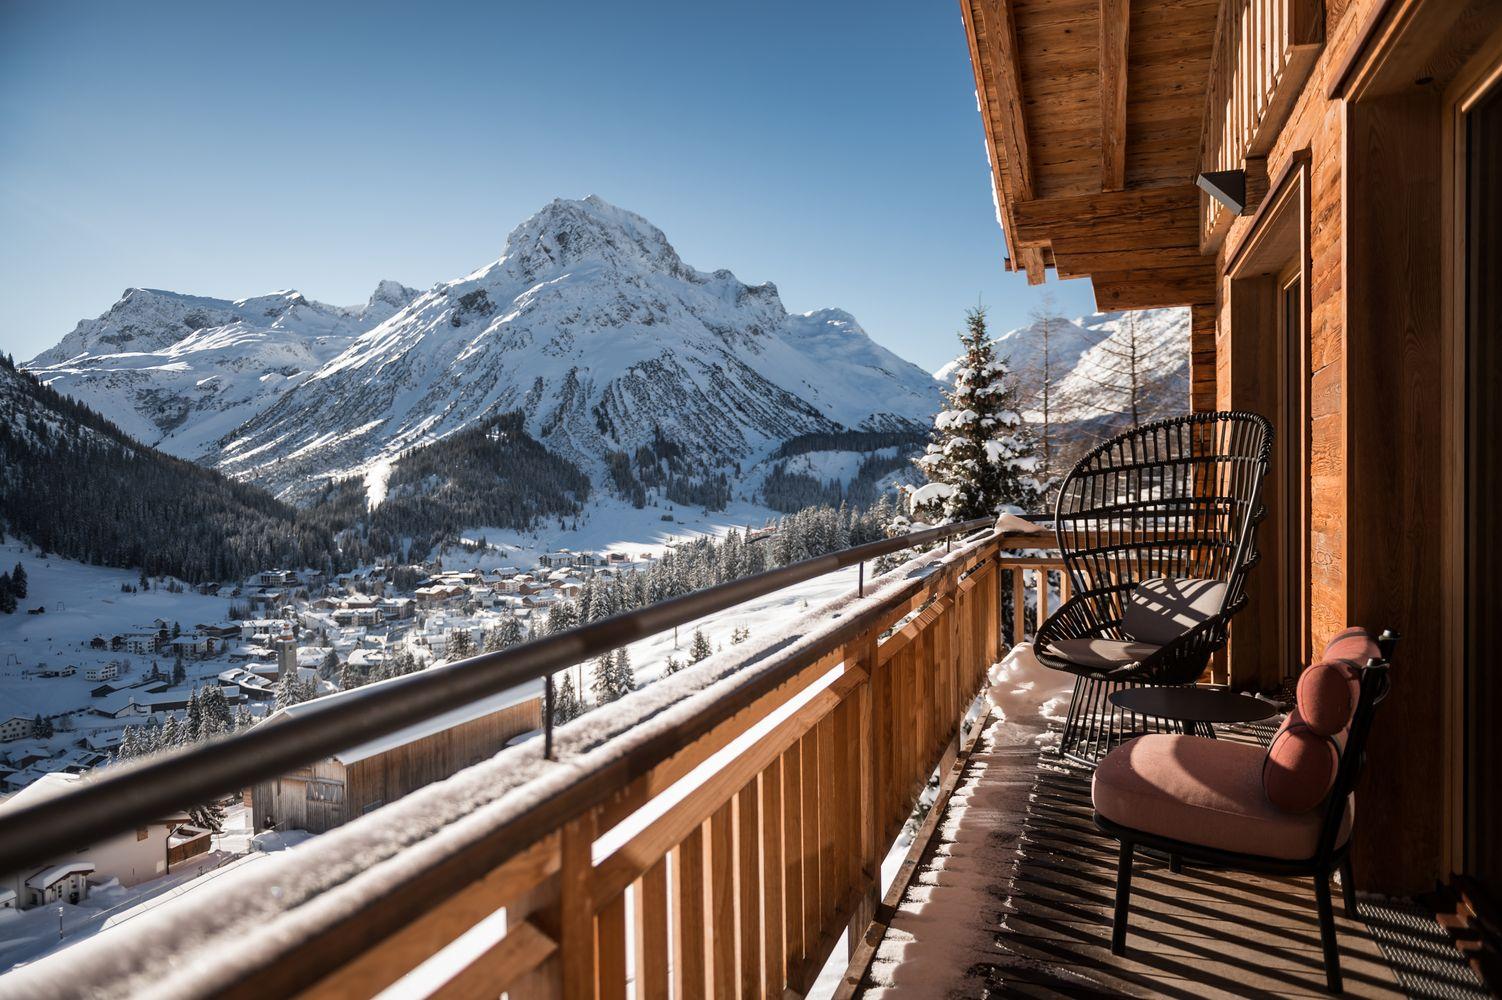 Arula Chalet - Lech, Switzerland